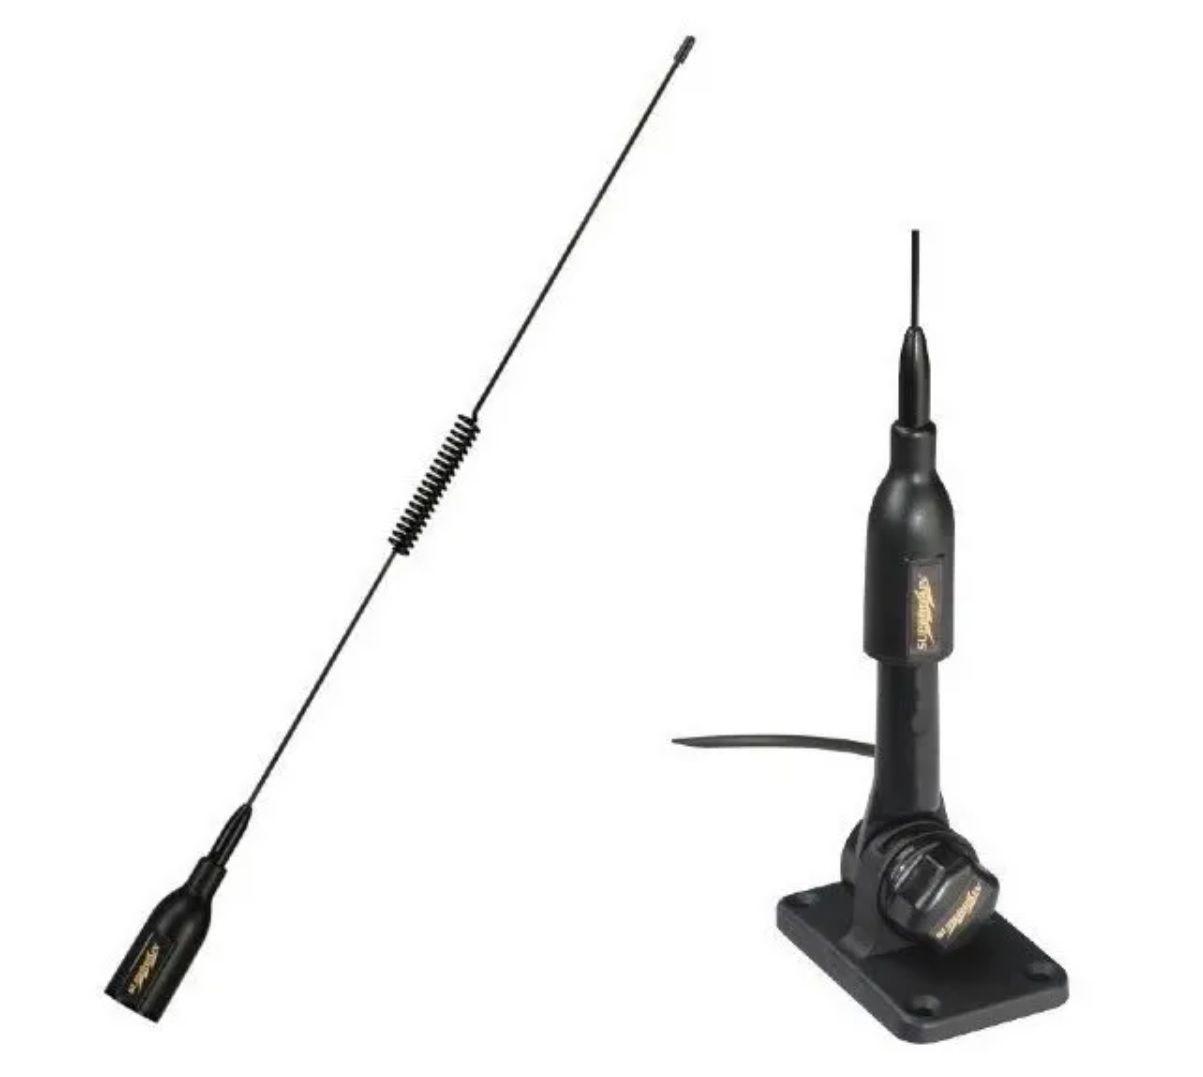 Antena VHF Náutica 3 dB para Rádio VHF com Base 53cm Supergain para Lanchas Barcos Jet Skis SGV70PBBK